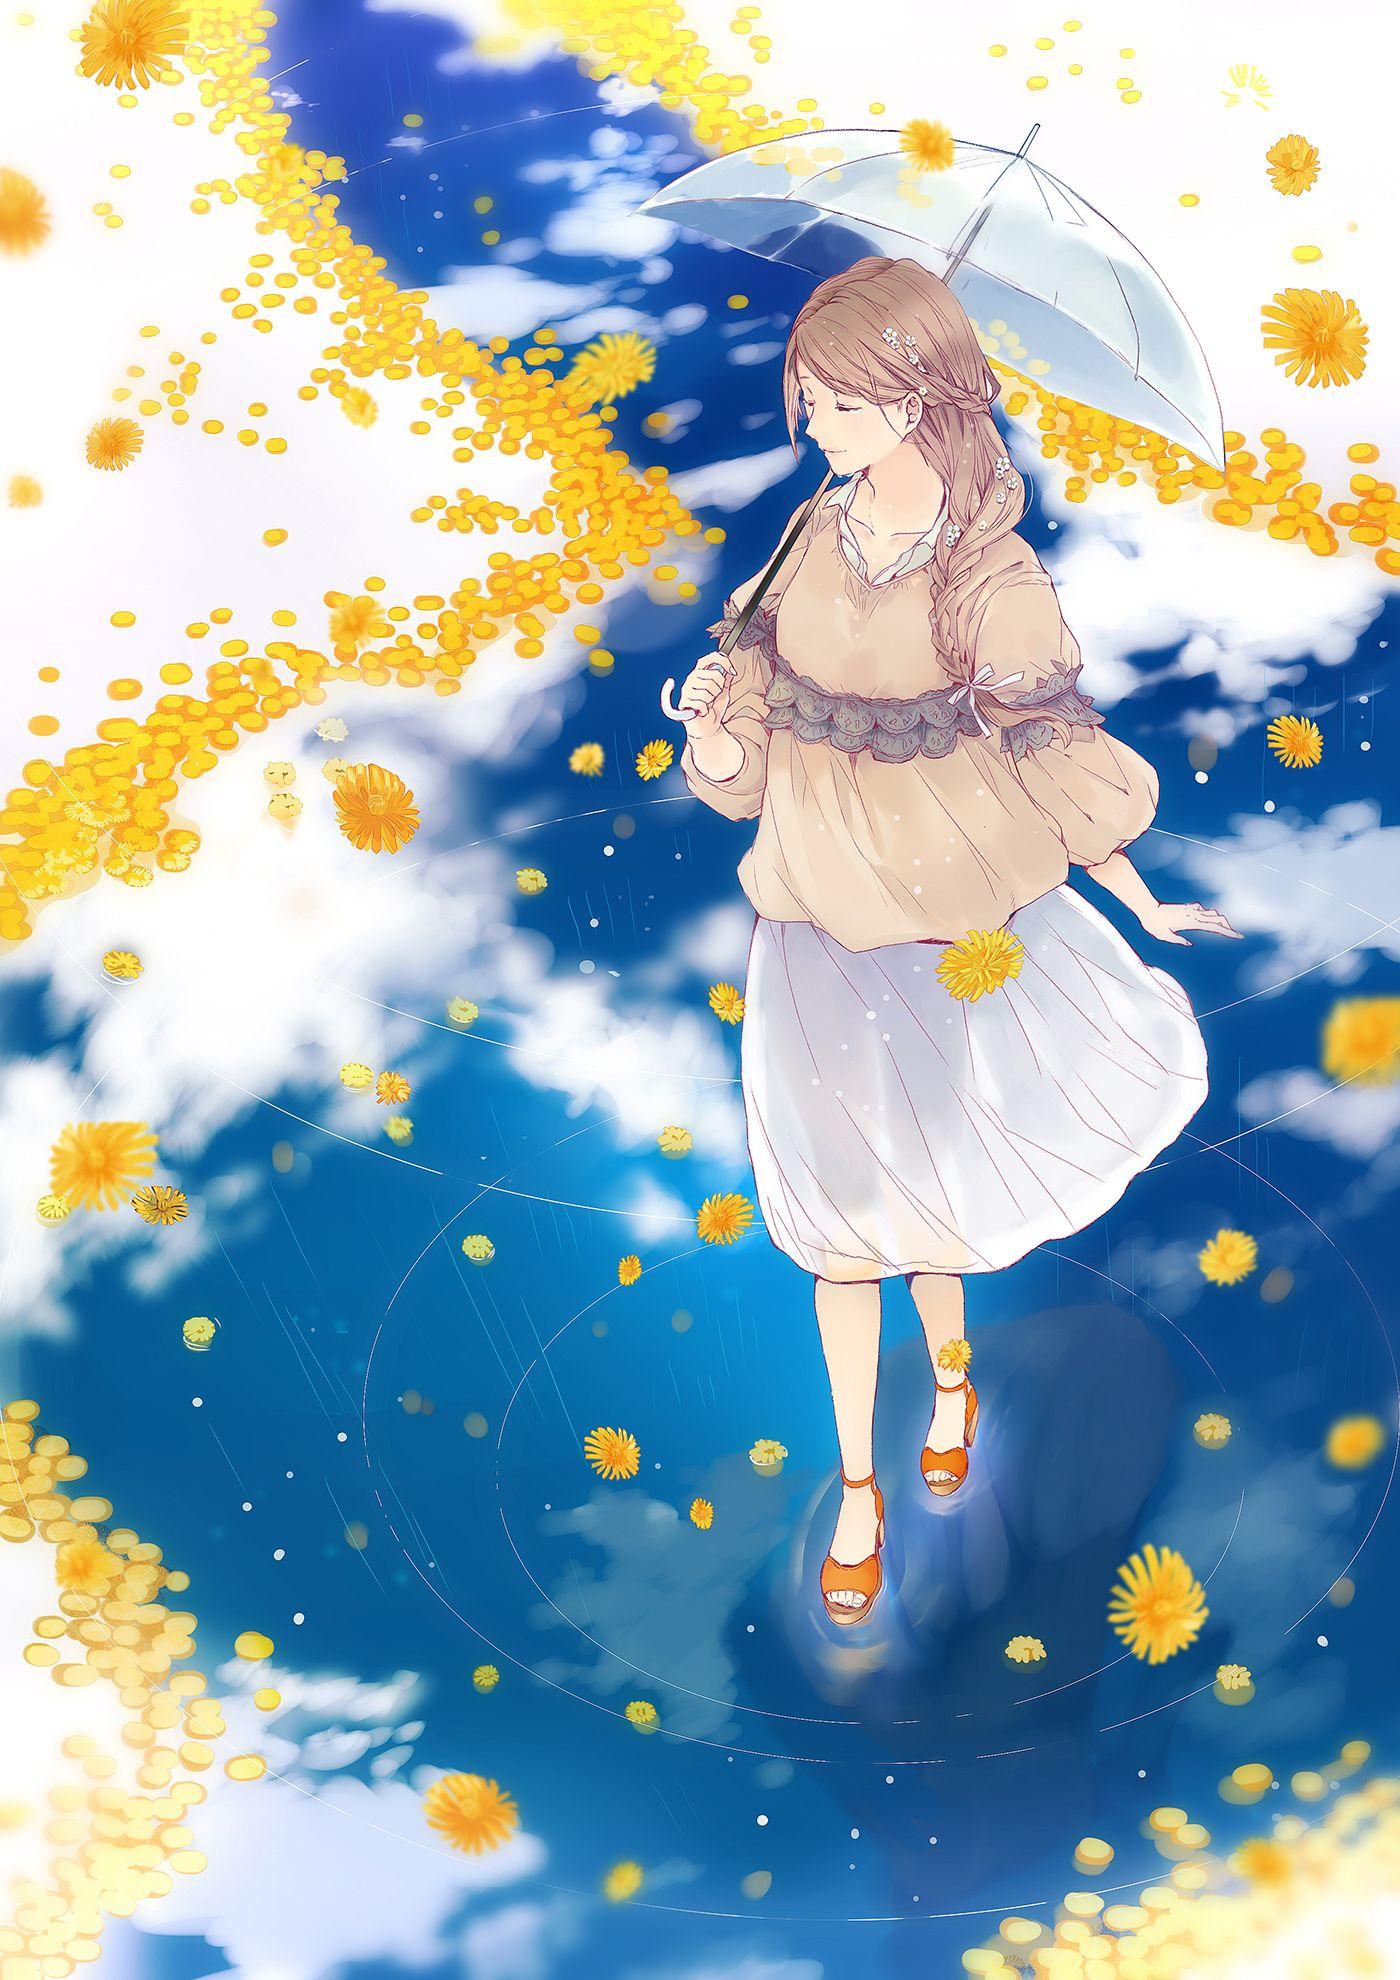 Falling warm rain. Is so beautiful...